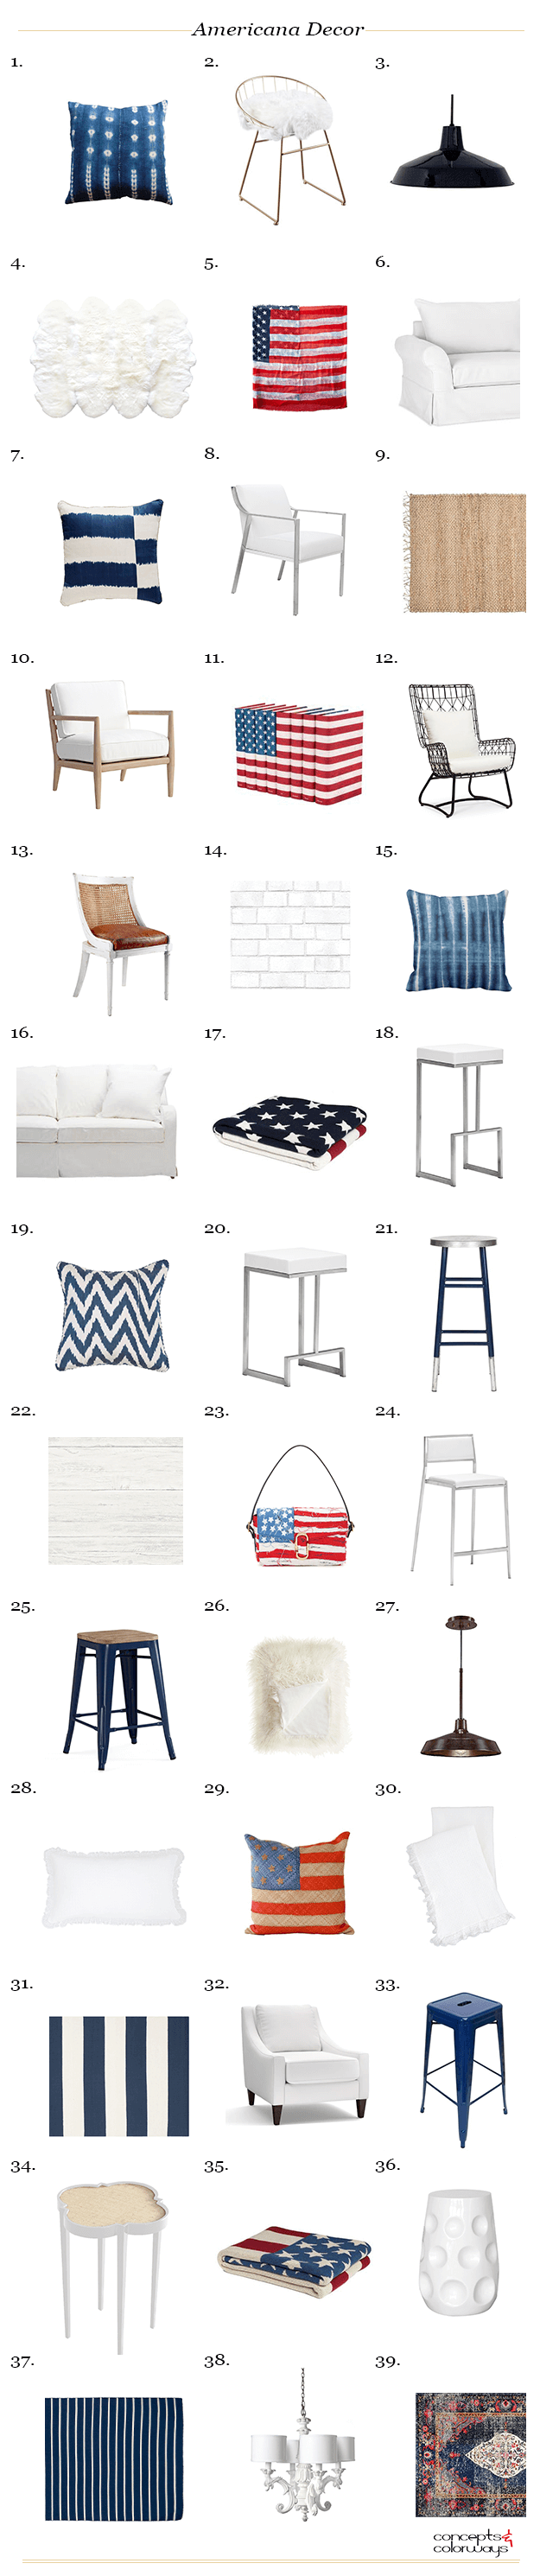 americana decor product roundup